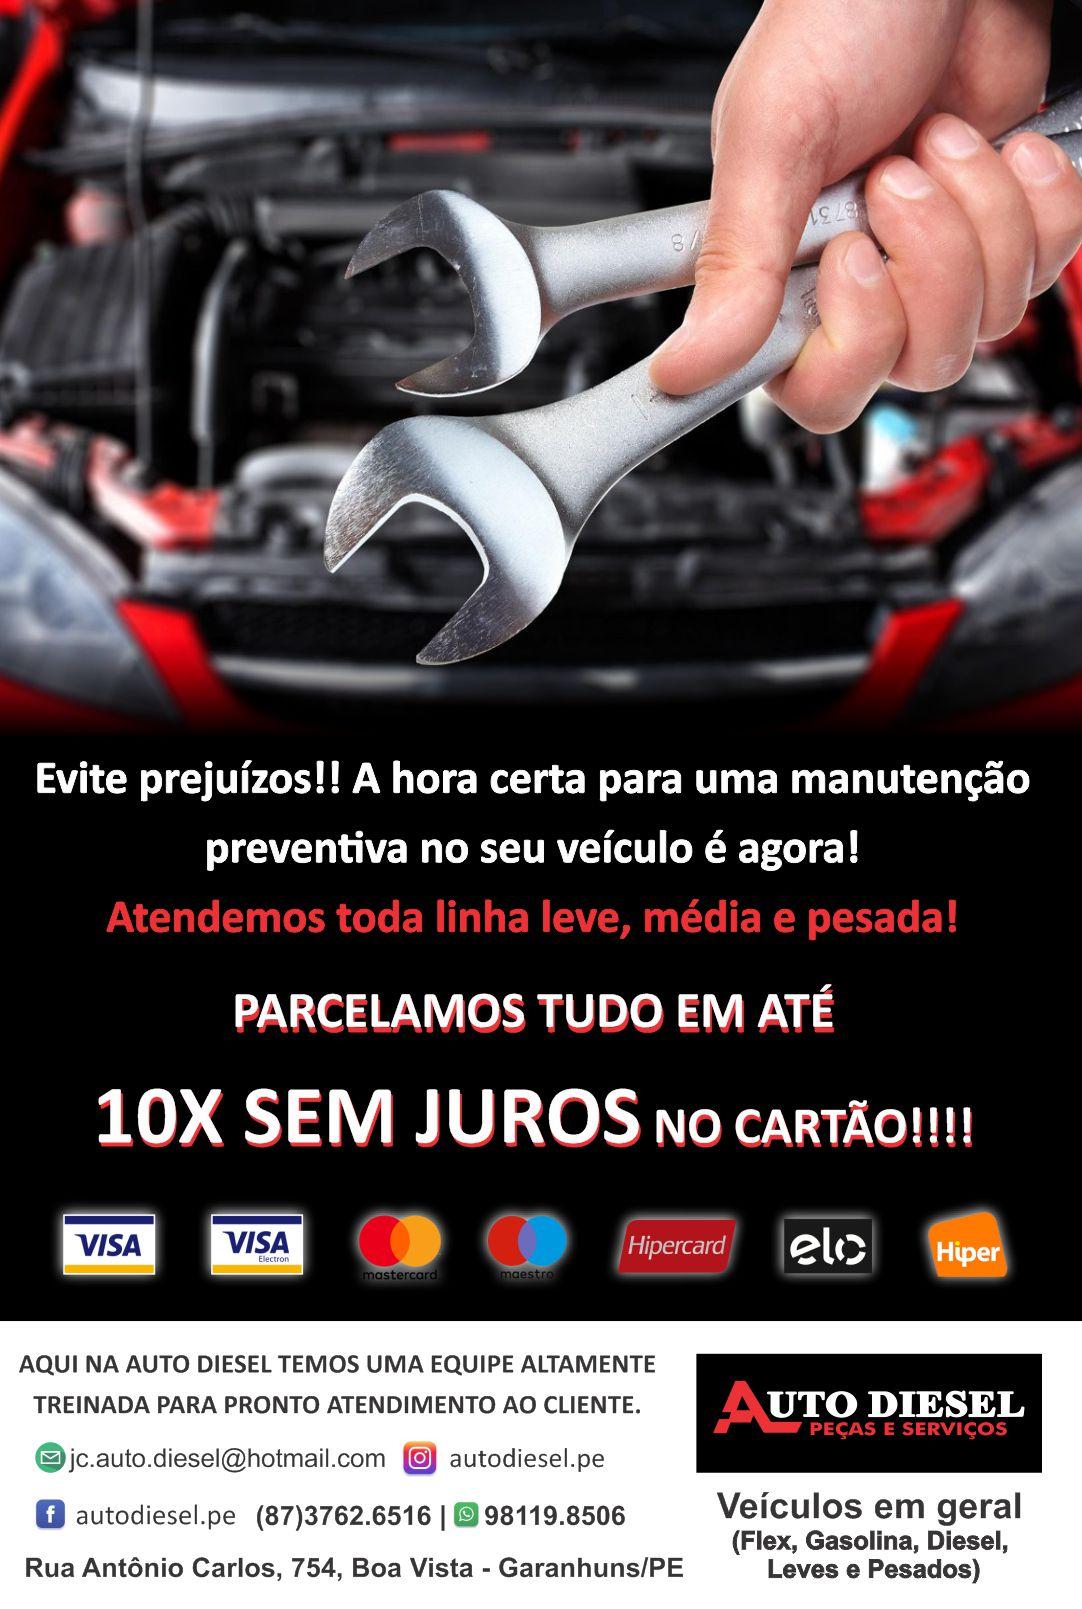 AUTO-DIESEL PEÇAS E SERVIÇOS